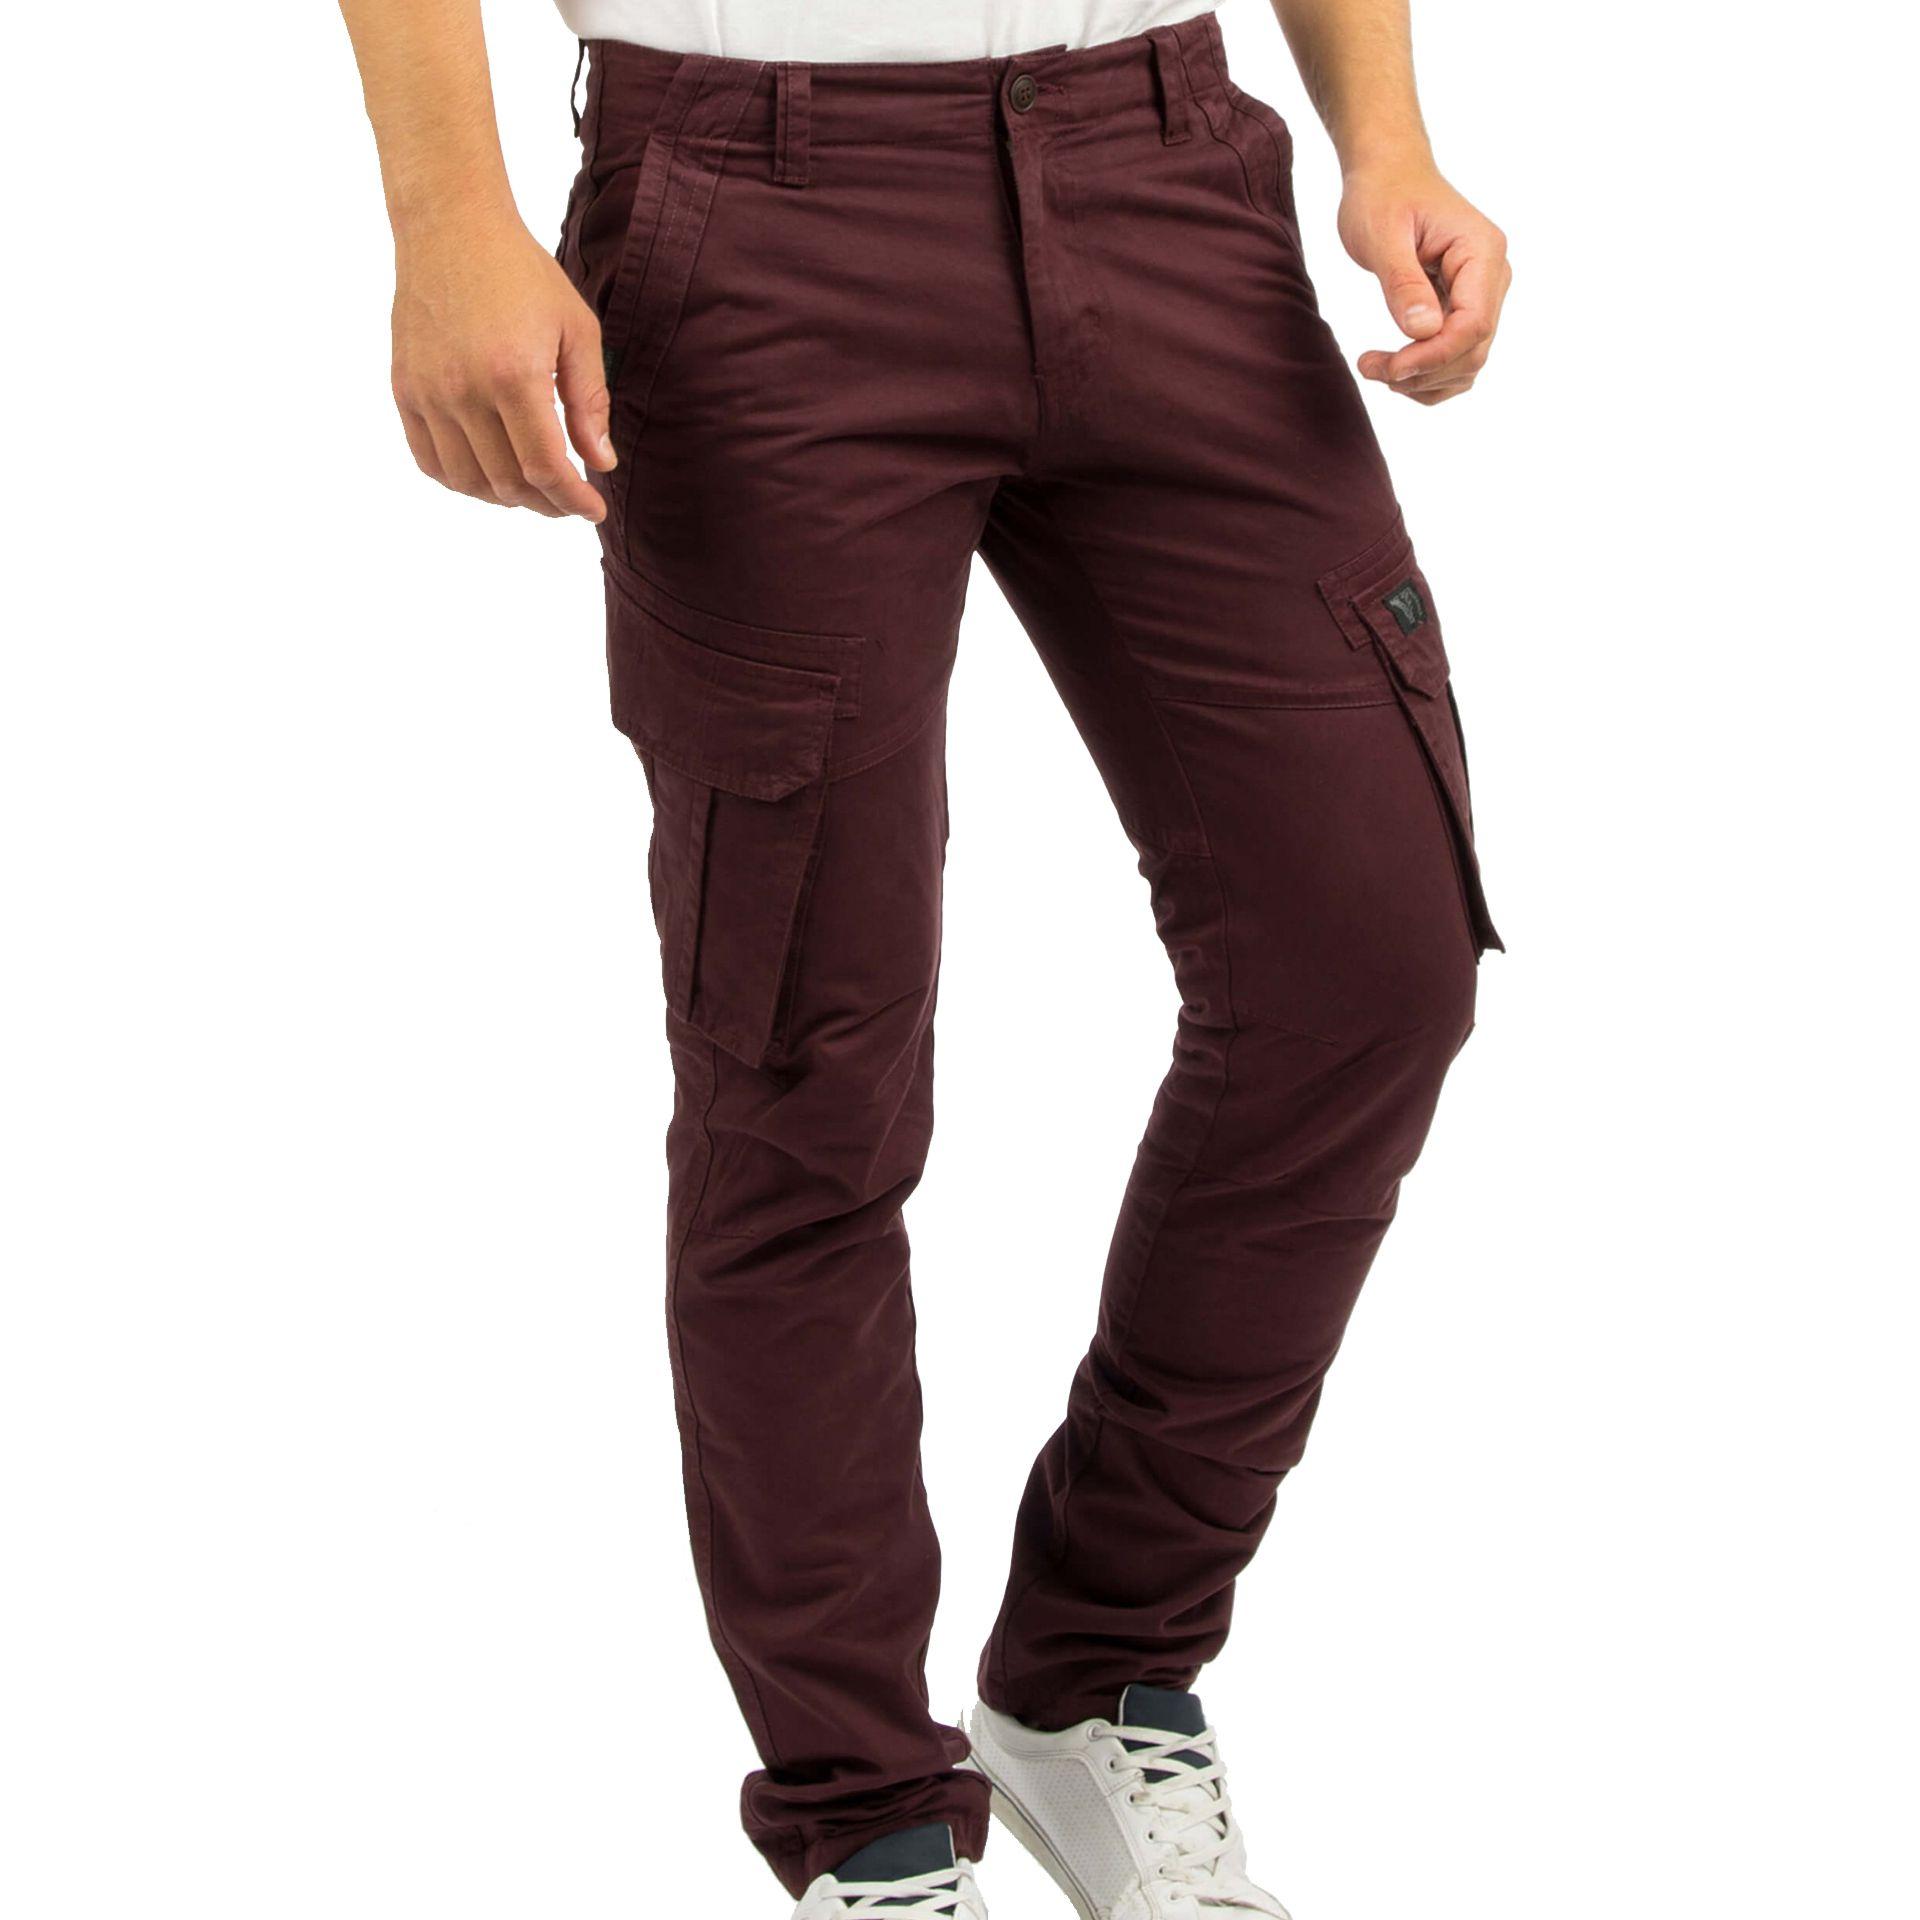 5ddb9bb28c33 Ανδρικά   Ρούχα   Παντελόνια   Casual   Classic   Ανδρικό παντελόνι ...